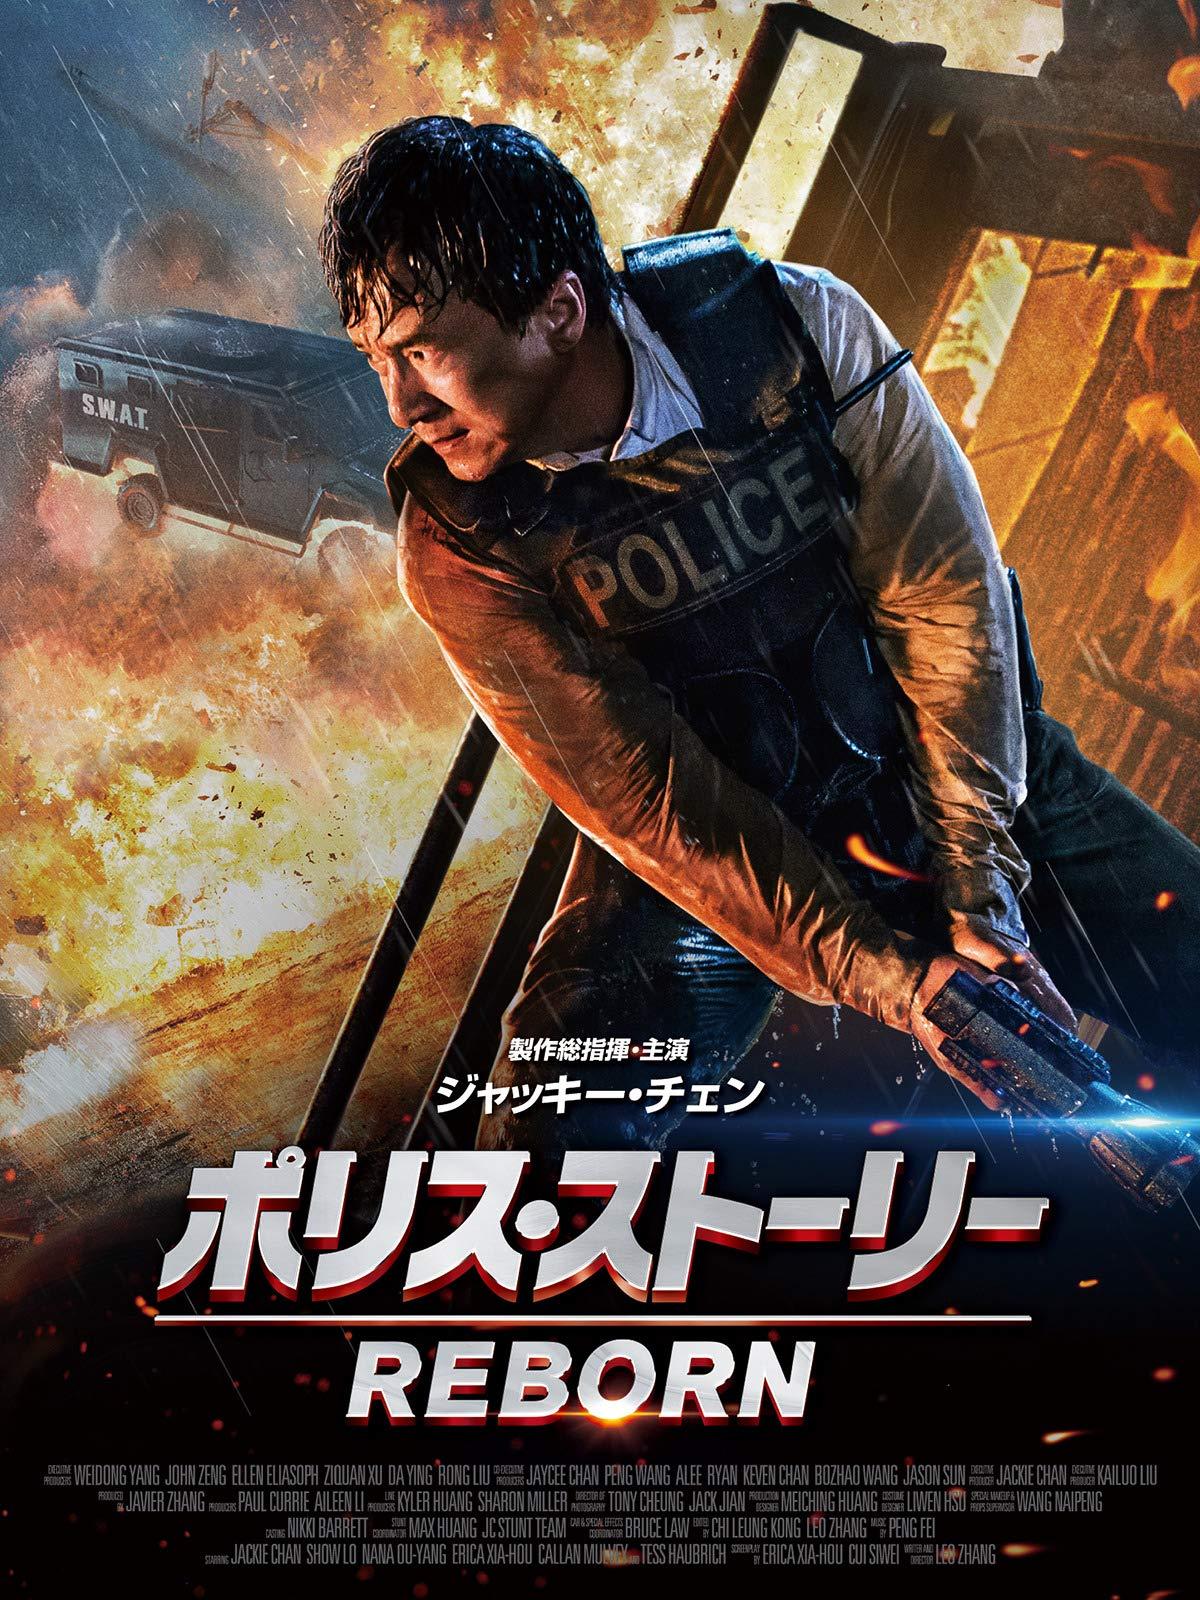 Amazon Co Jp ポリス ストーリー Reborn 吹替版 を観る Prime Video